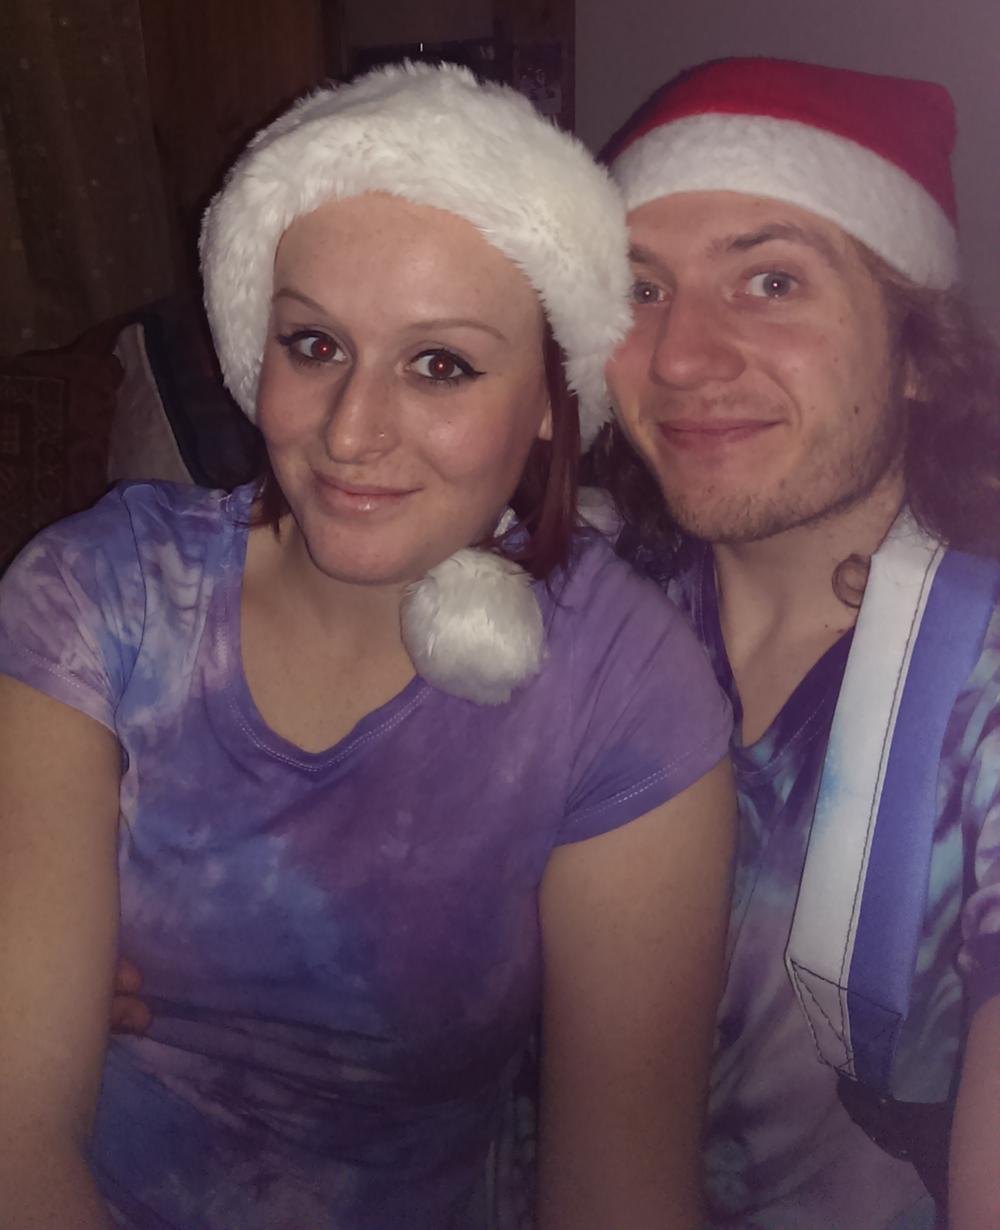 Bring on christmas!!